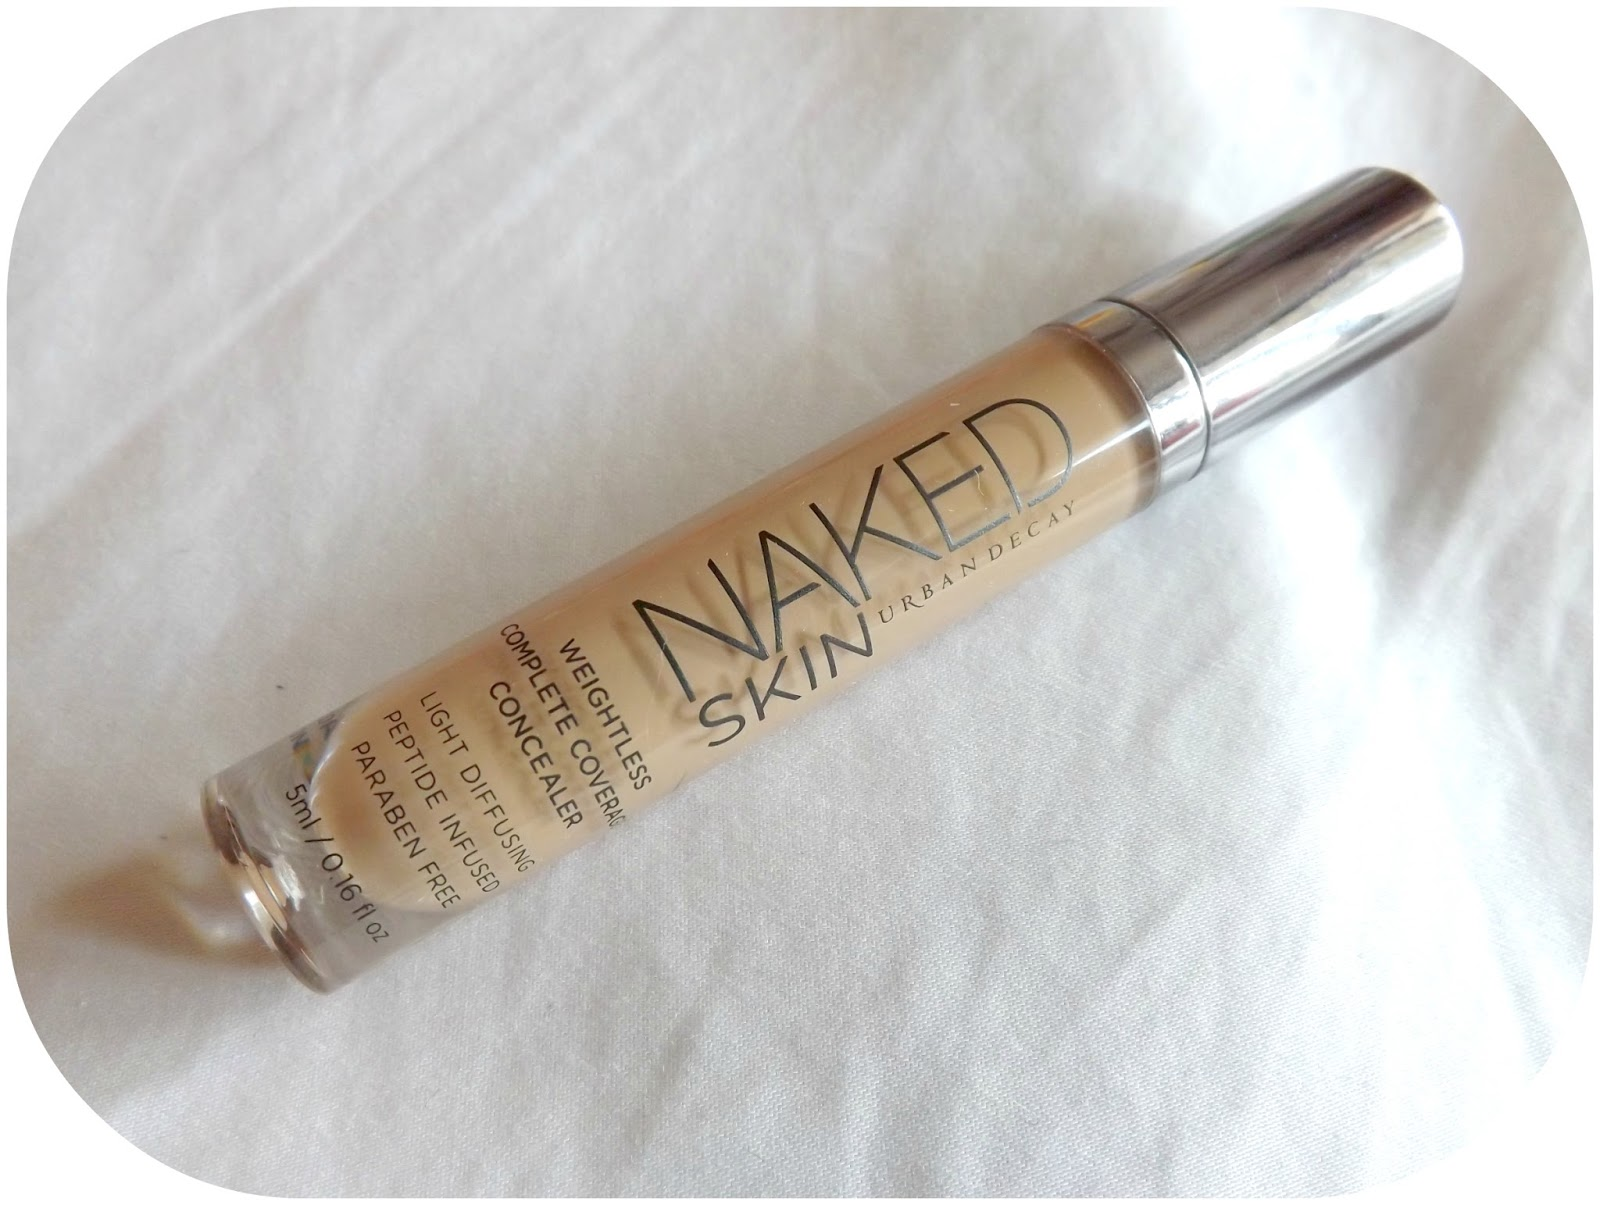 Urban Decay Naked Skin Weightless Complete Concealer Med